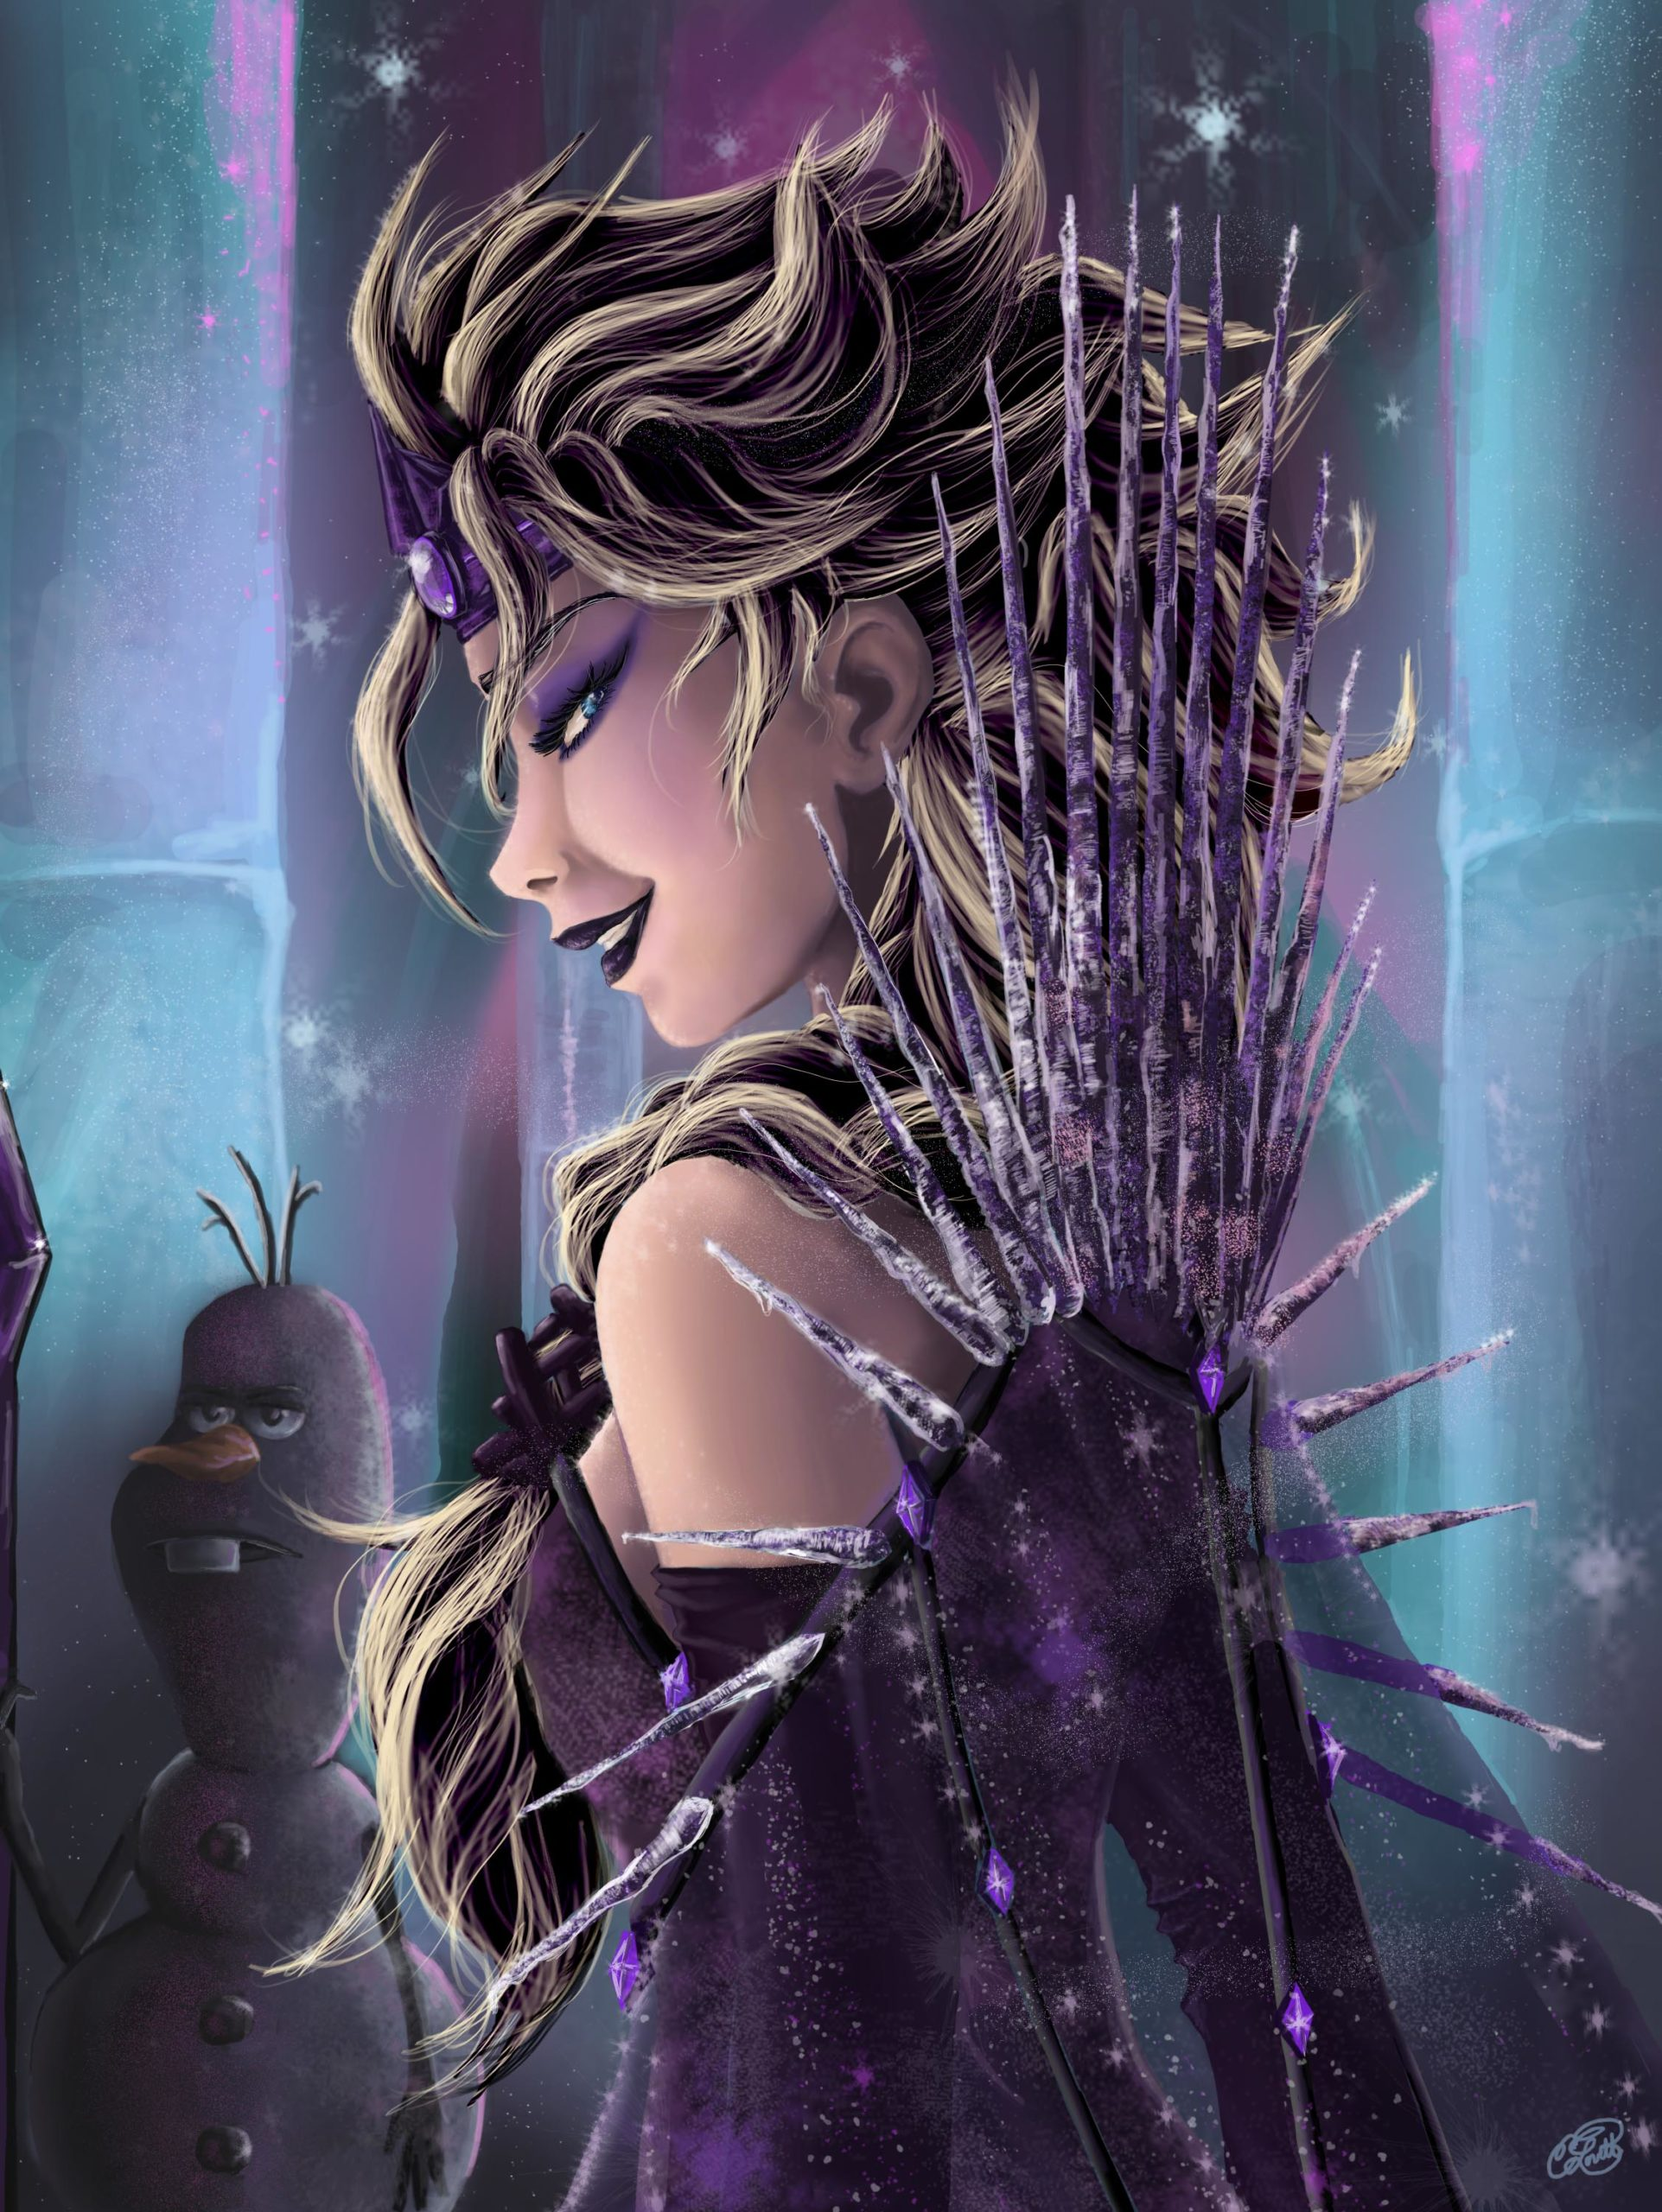 Disney princesses reimagined as villains 11